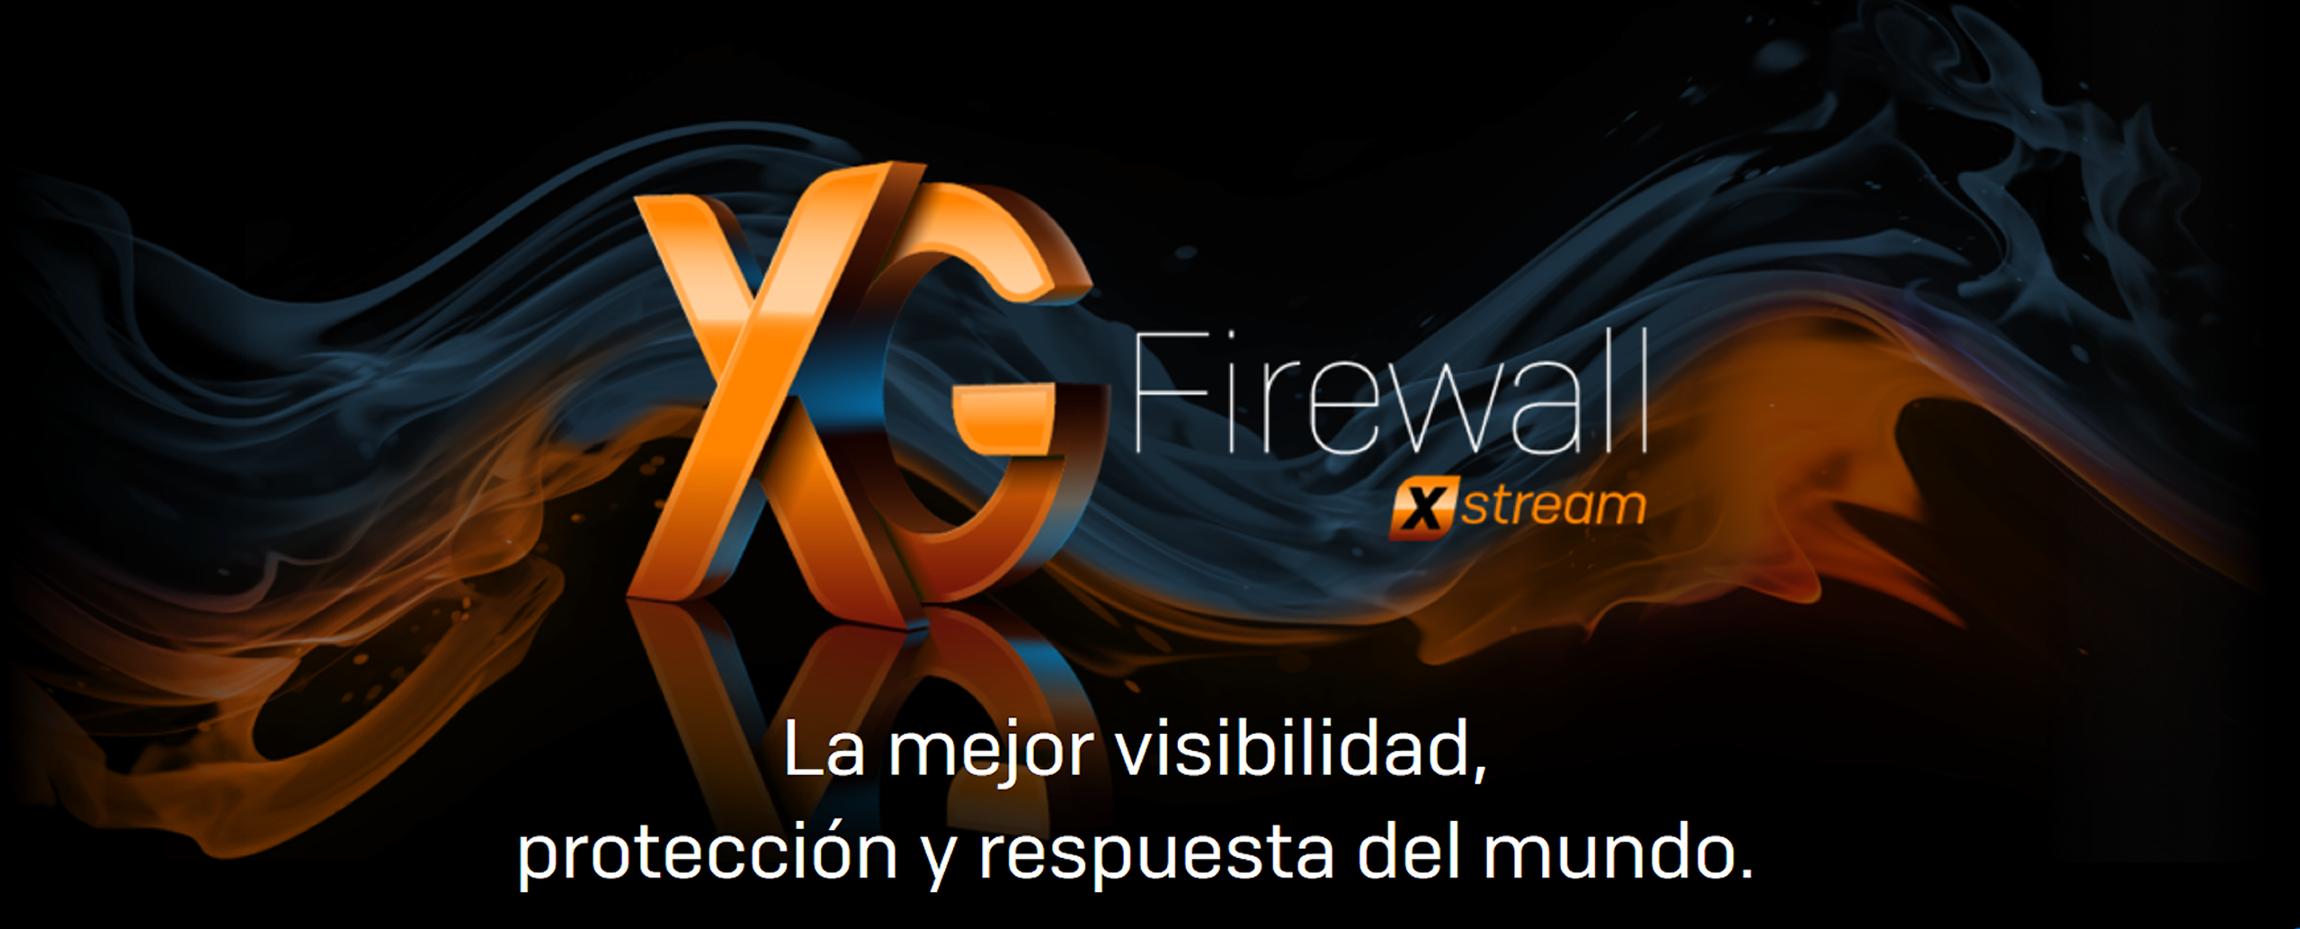 XgFirewallX